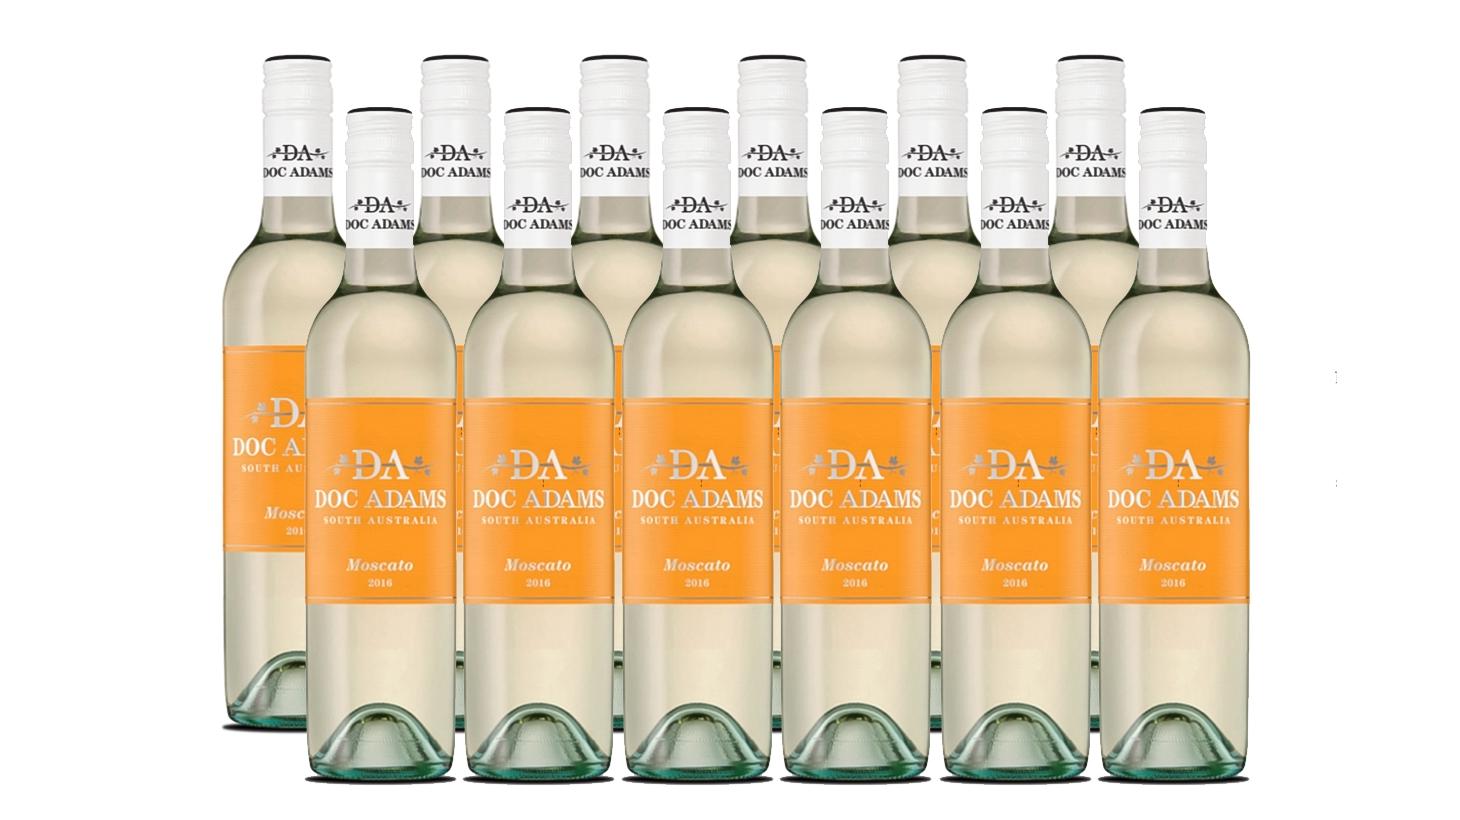 One dozen bottles of Doc Adams 2016 Moscato